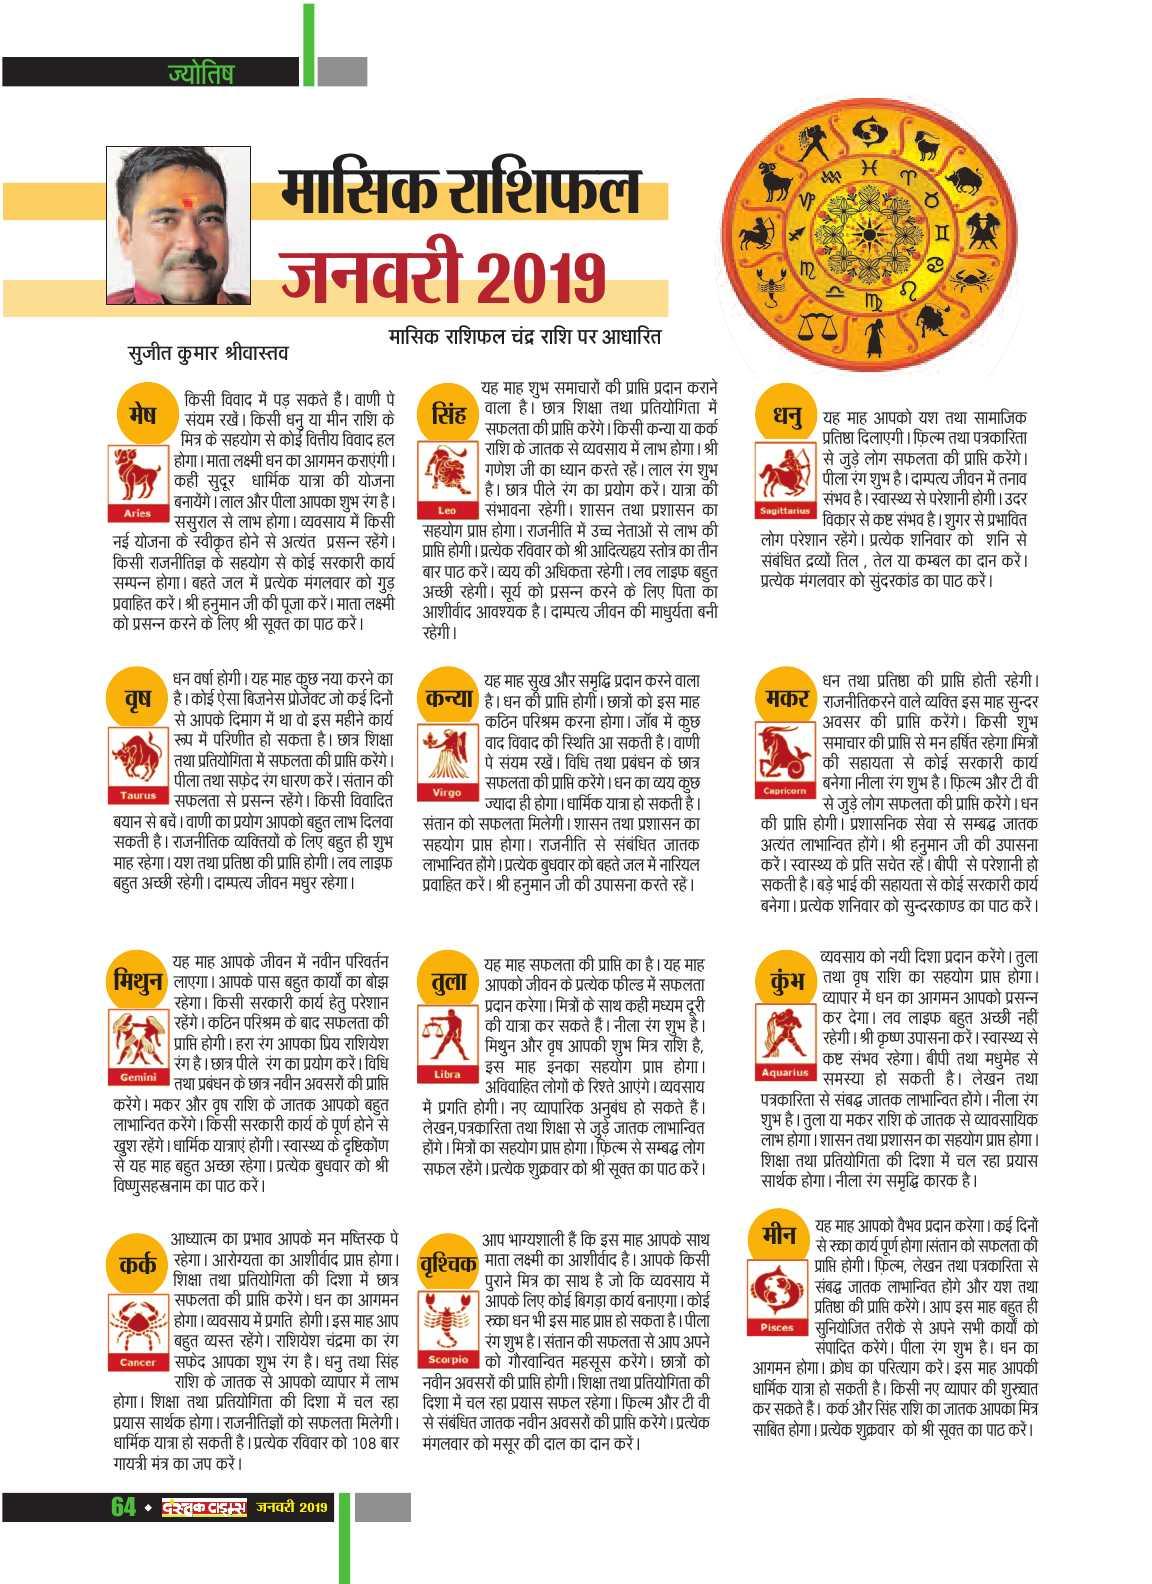 Dastak Times for E-Magazine 15 Jan 2019 new66